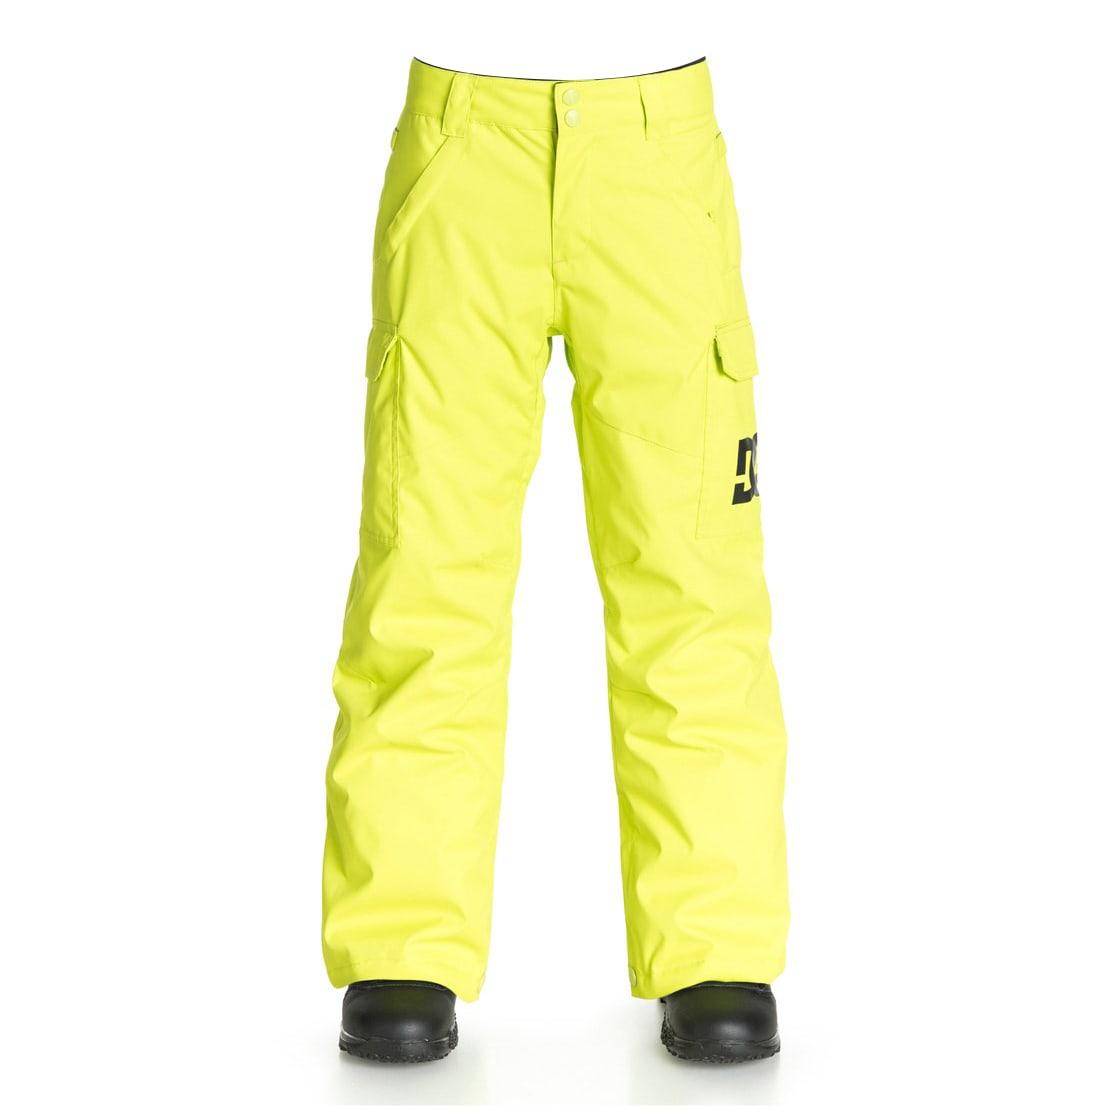 Kids Marvel Comic Print Snow Pants. Product - Arctix Insulated Cargo Snowsports Pants - 32